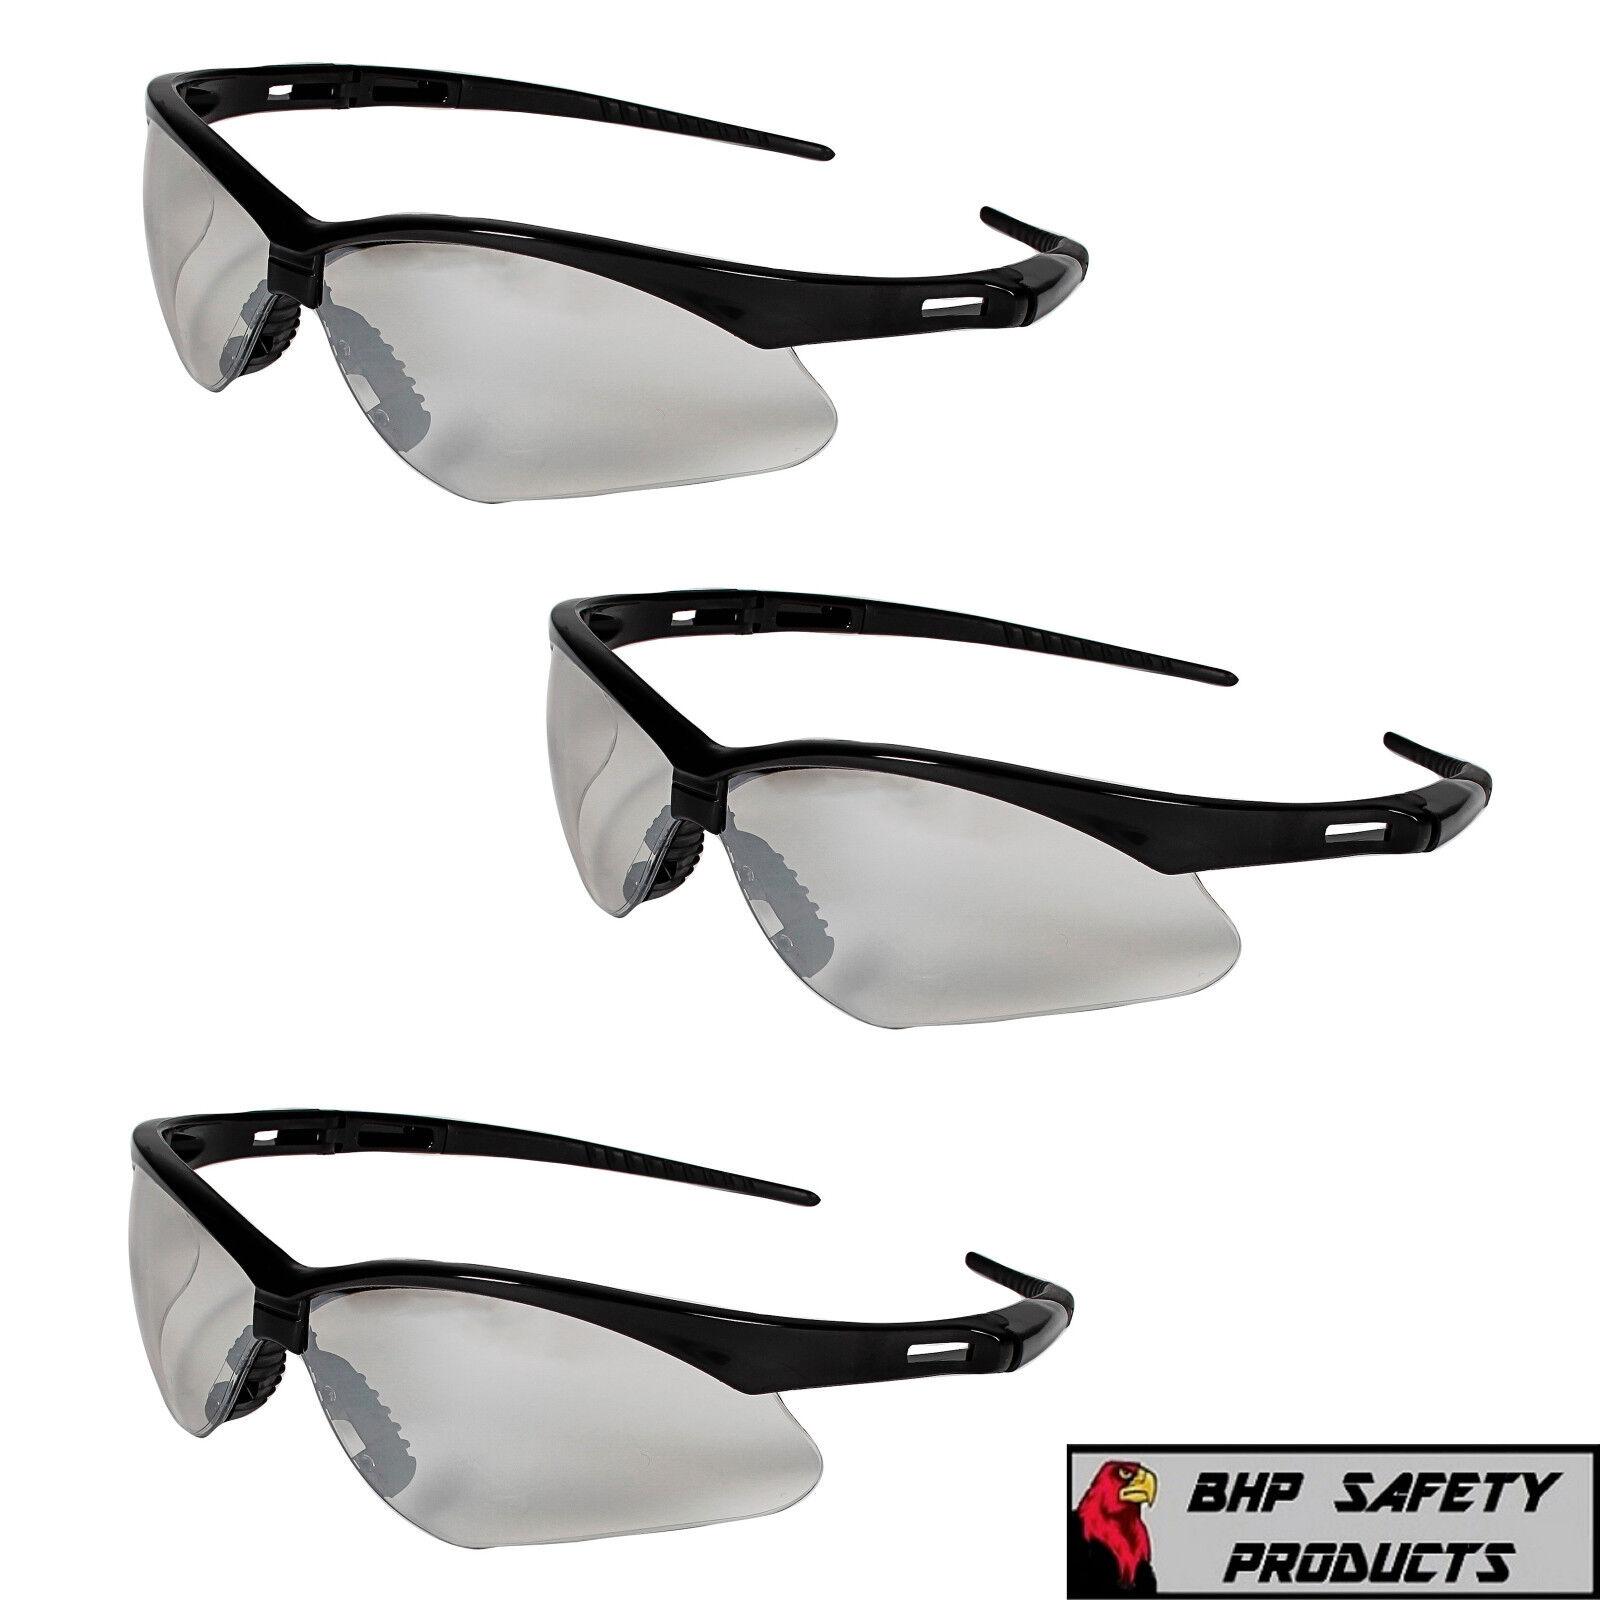 (3 PAIR) JACKSON NEMESIS SAFETY GLASSES INDOOR/OUTDOOR MIRROR BLACK FRAME 25685